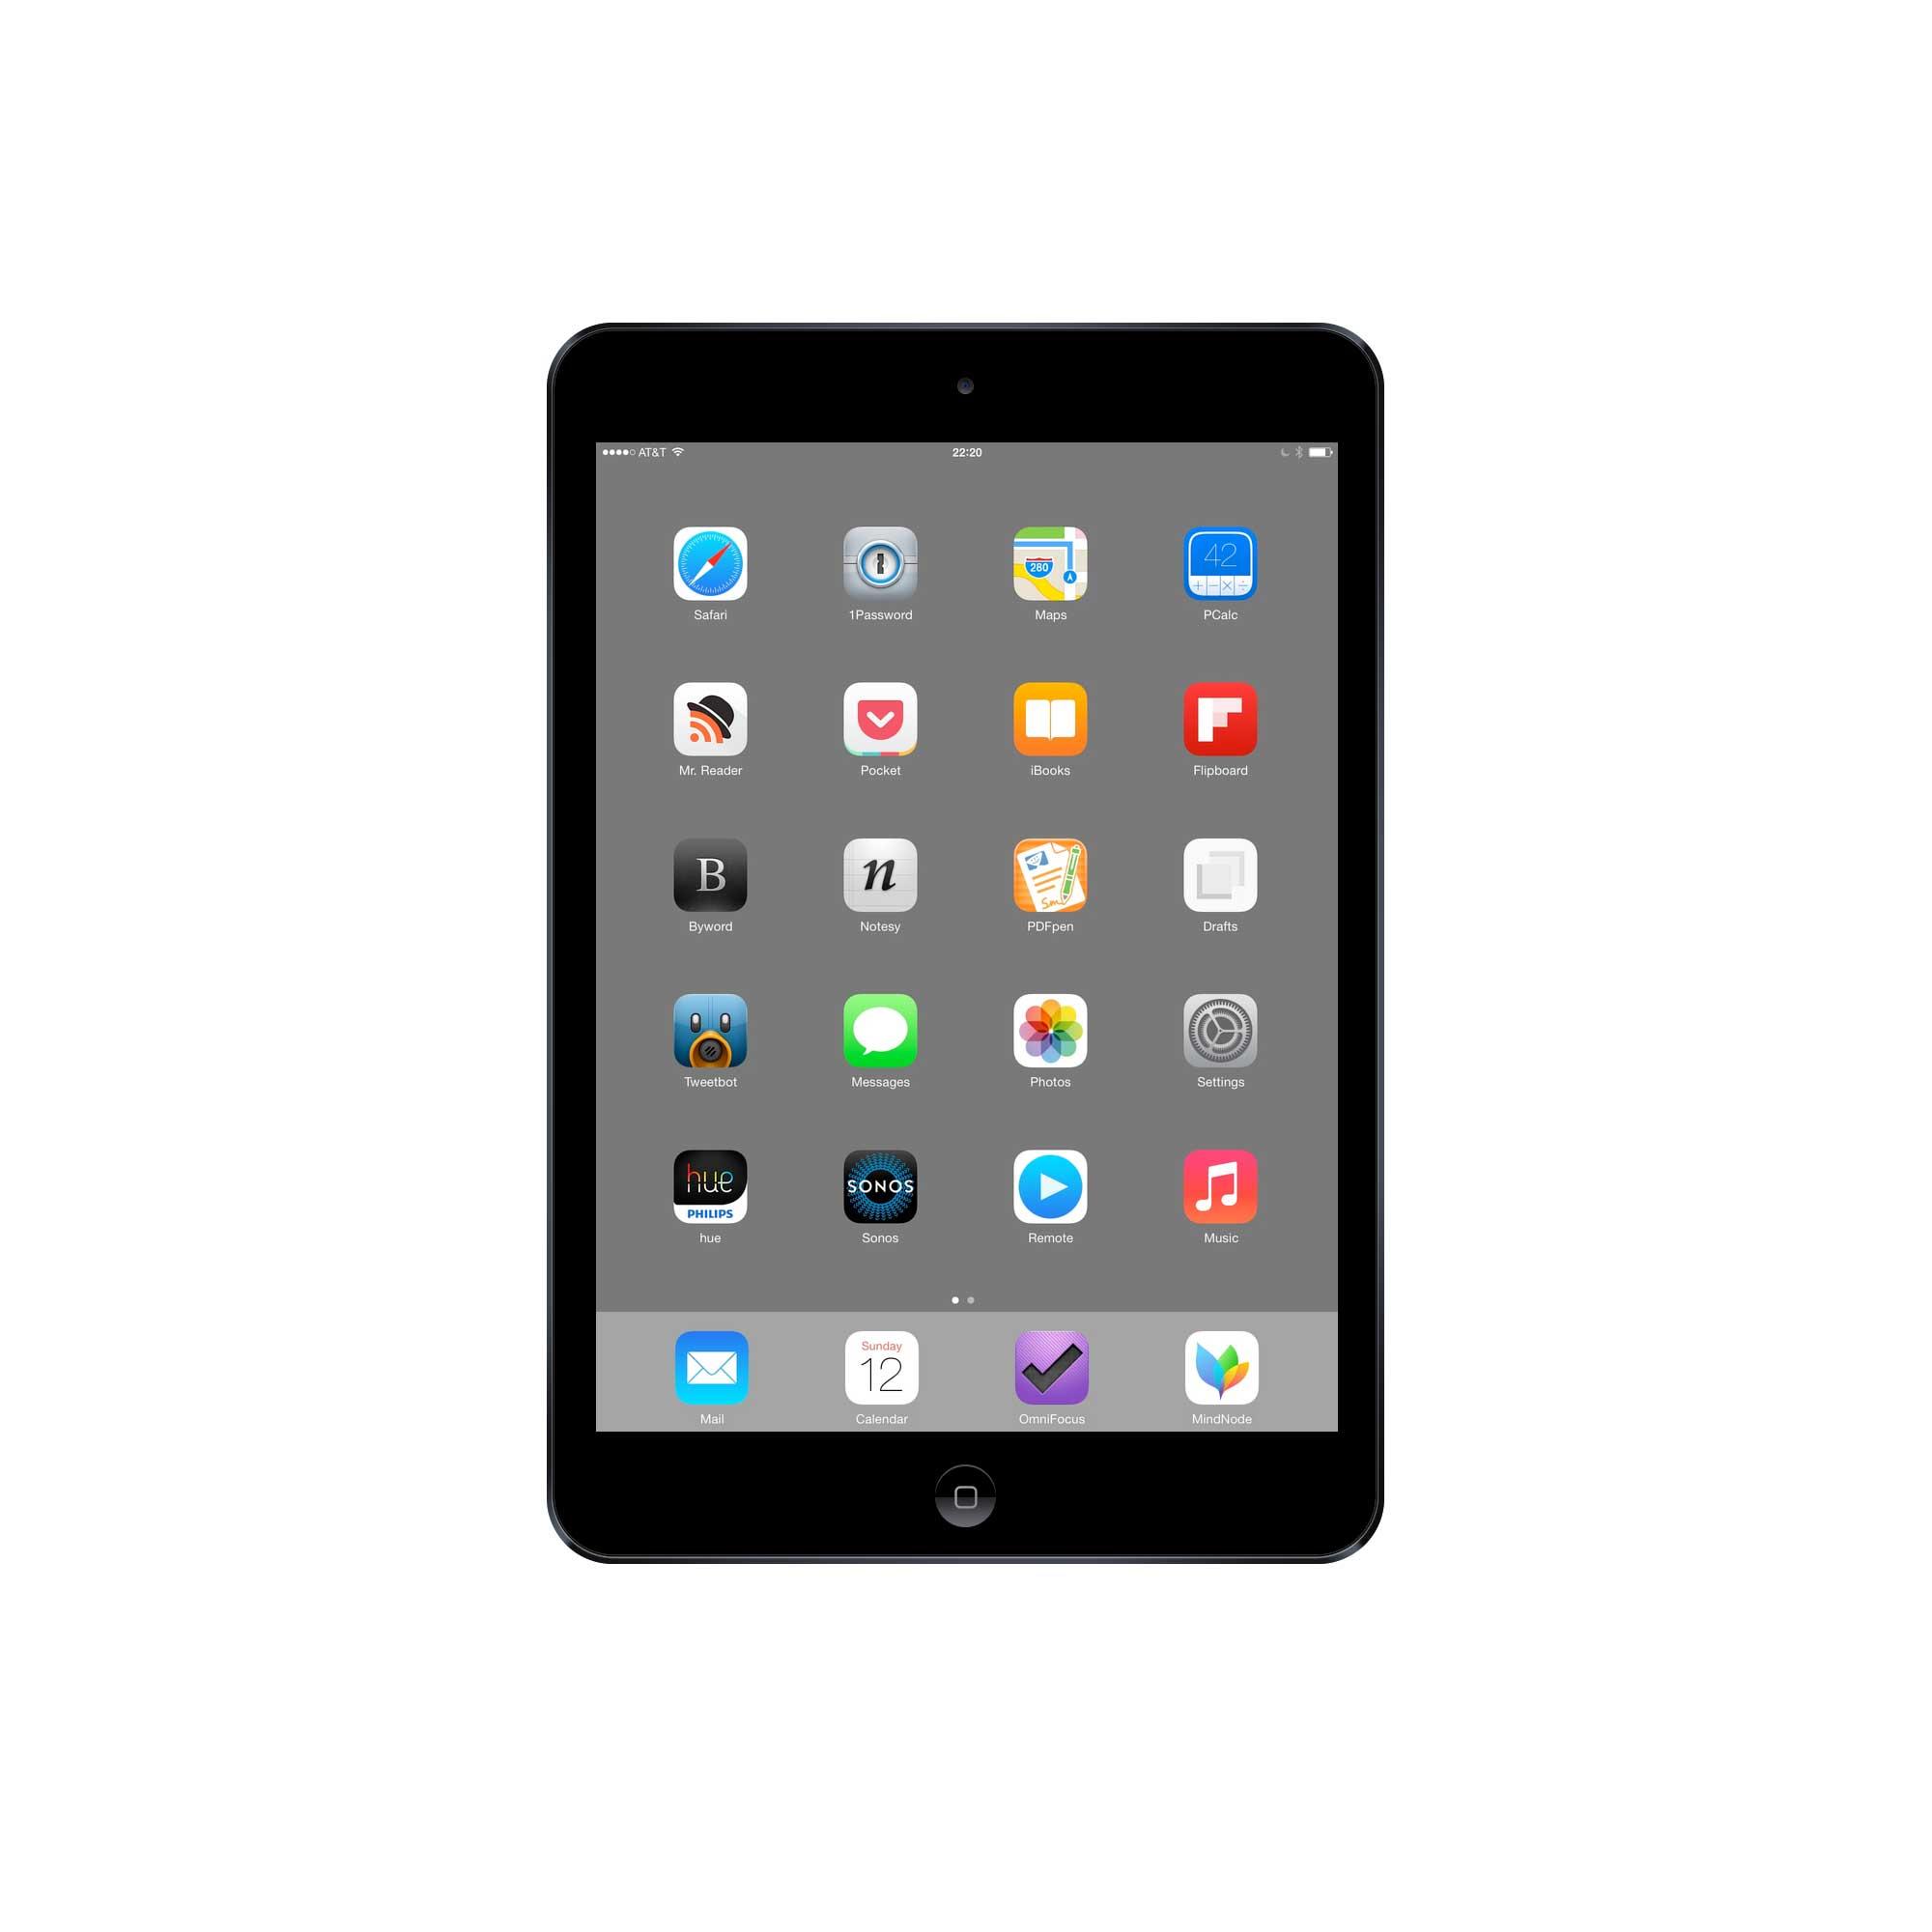 David Sparks' iPad Air